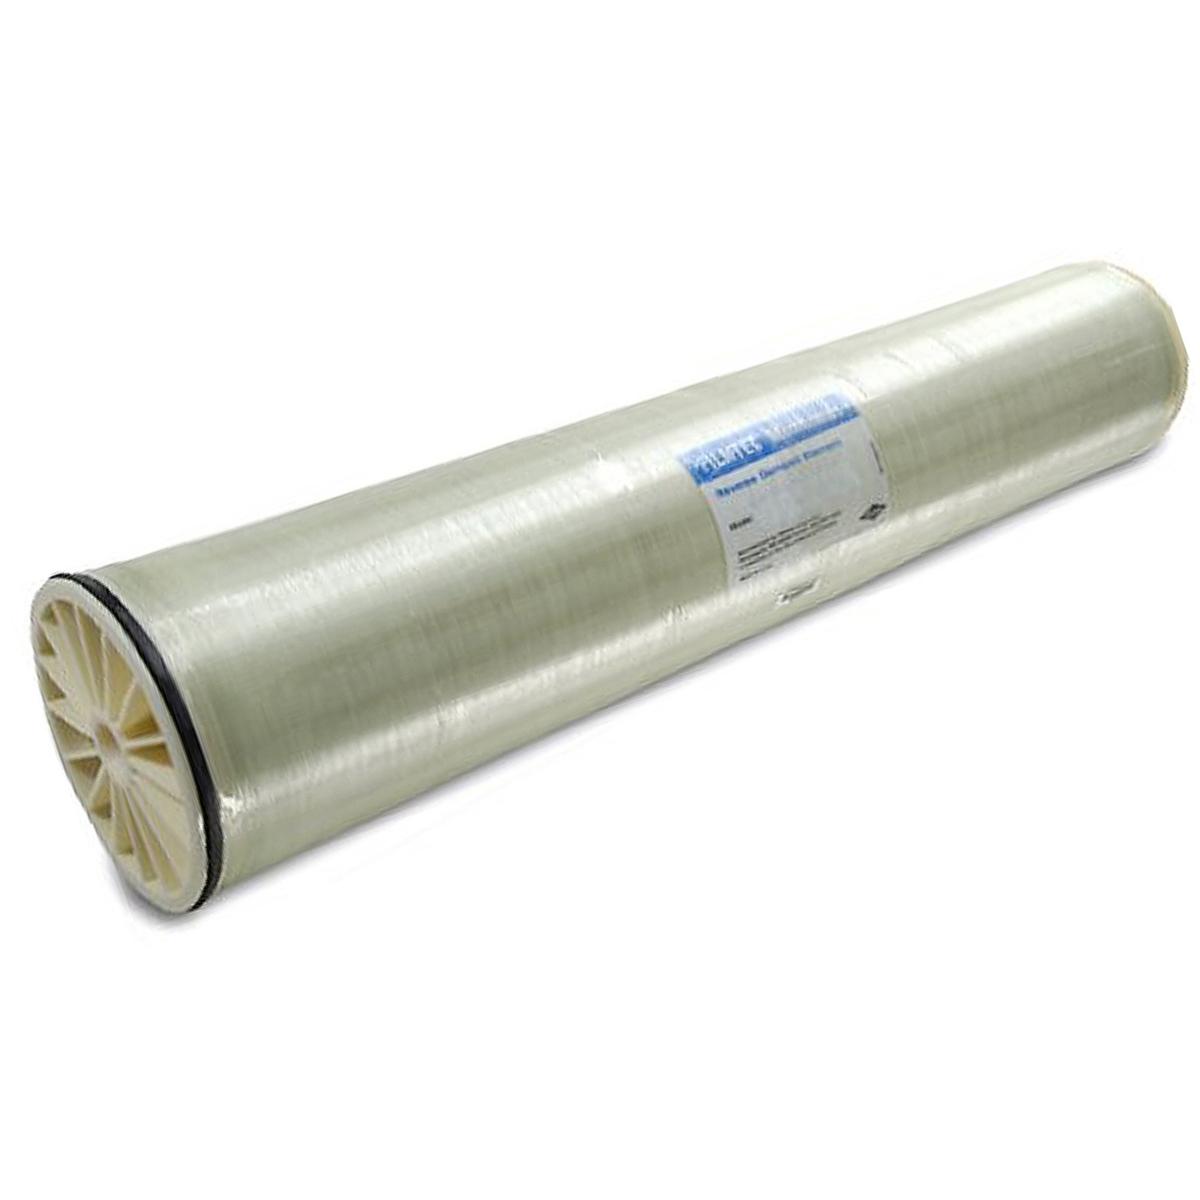 Filmtec Bw30 400 34i Brackish Water Desalination Membrane